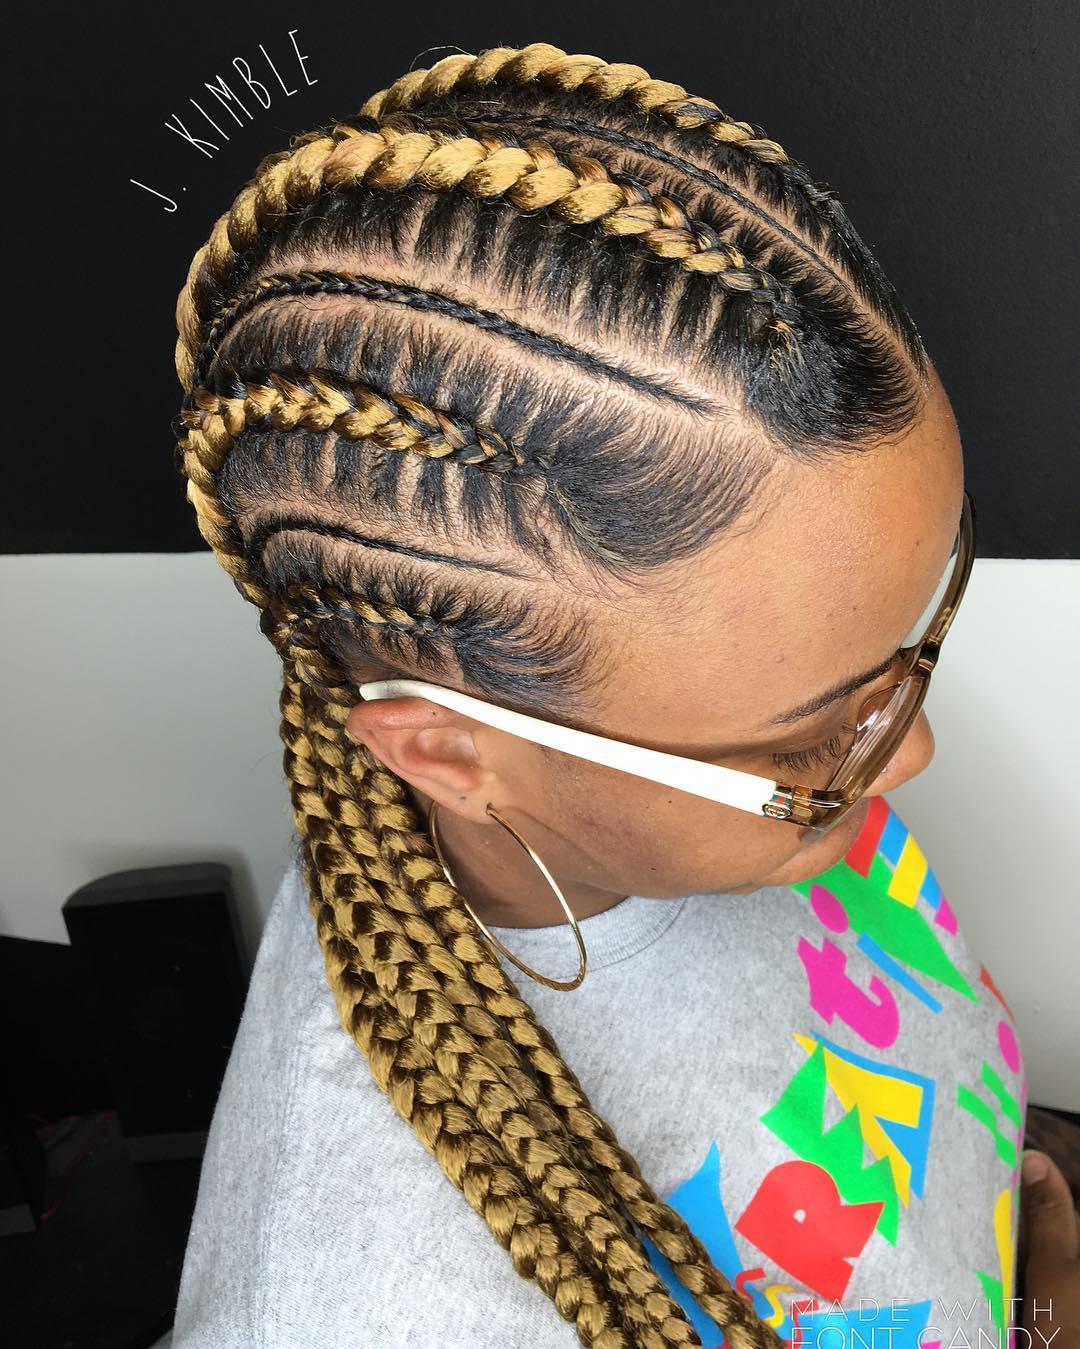 Stupendous 70 Best Black Braided Hairstyles That Turn Heads In 2017 Short Hairstyles Gunalazisus